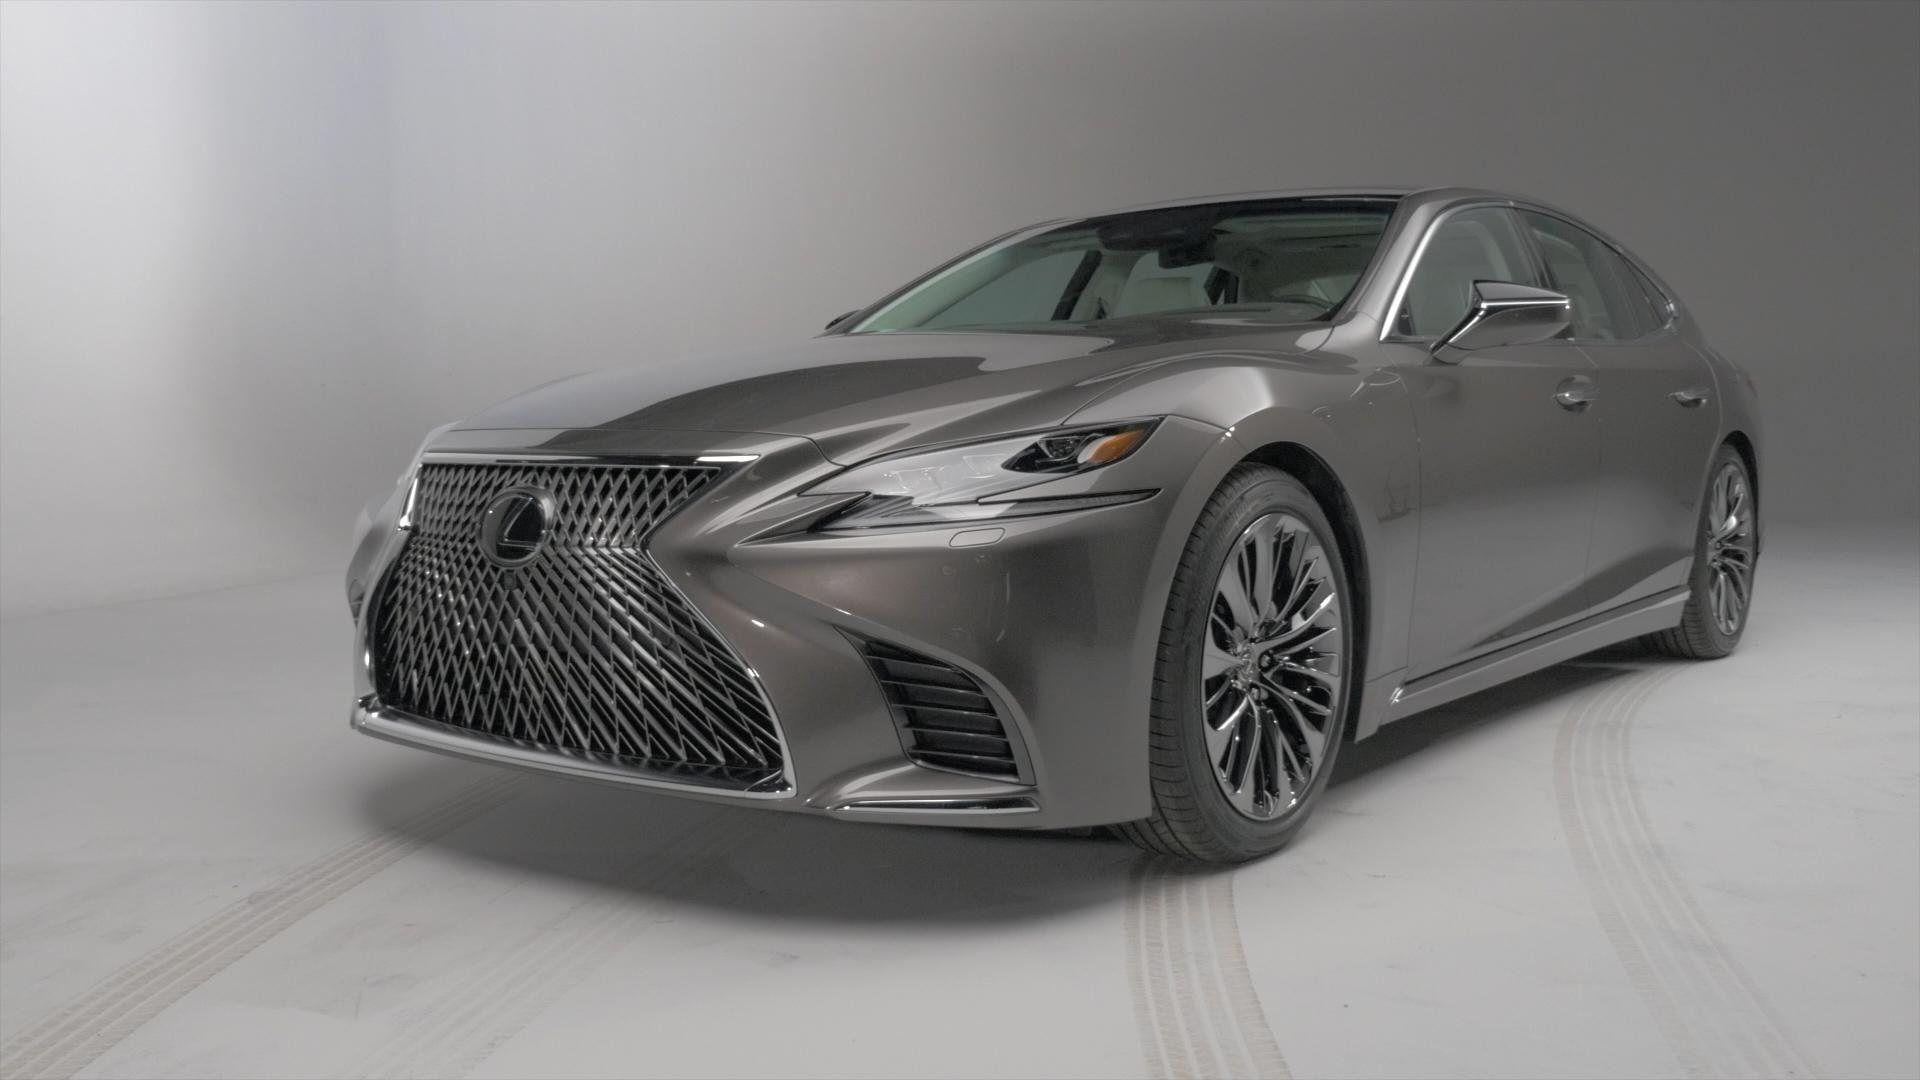 2021 Lexus Lf Lc Redesign in 2020 Lexus sport, Lexus